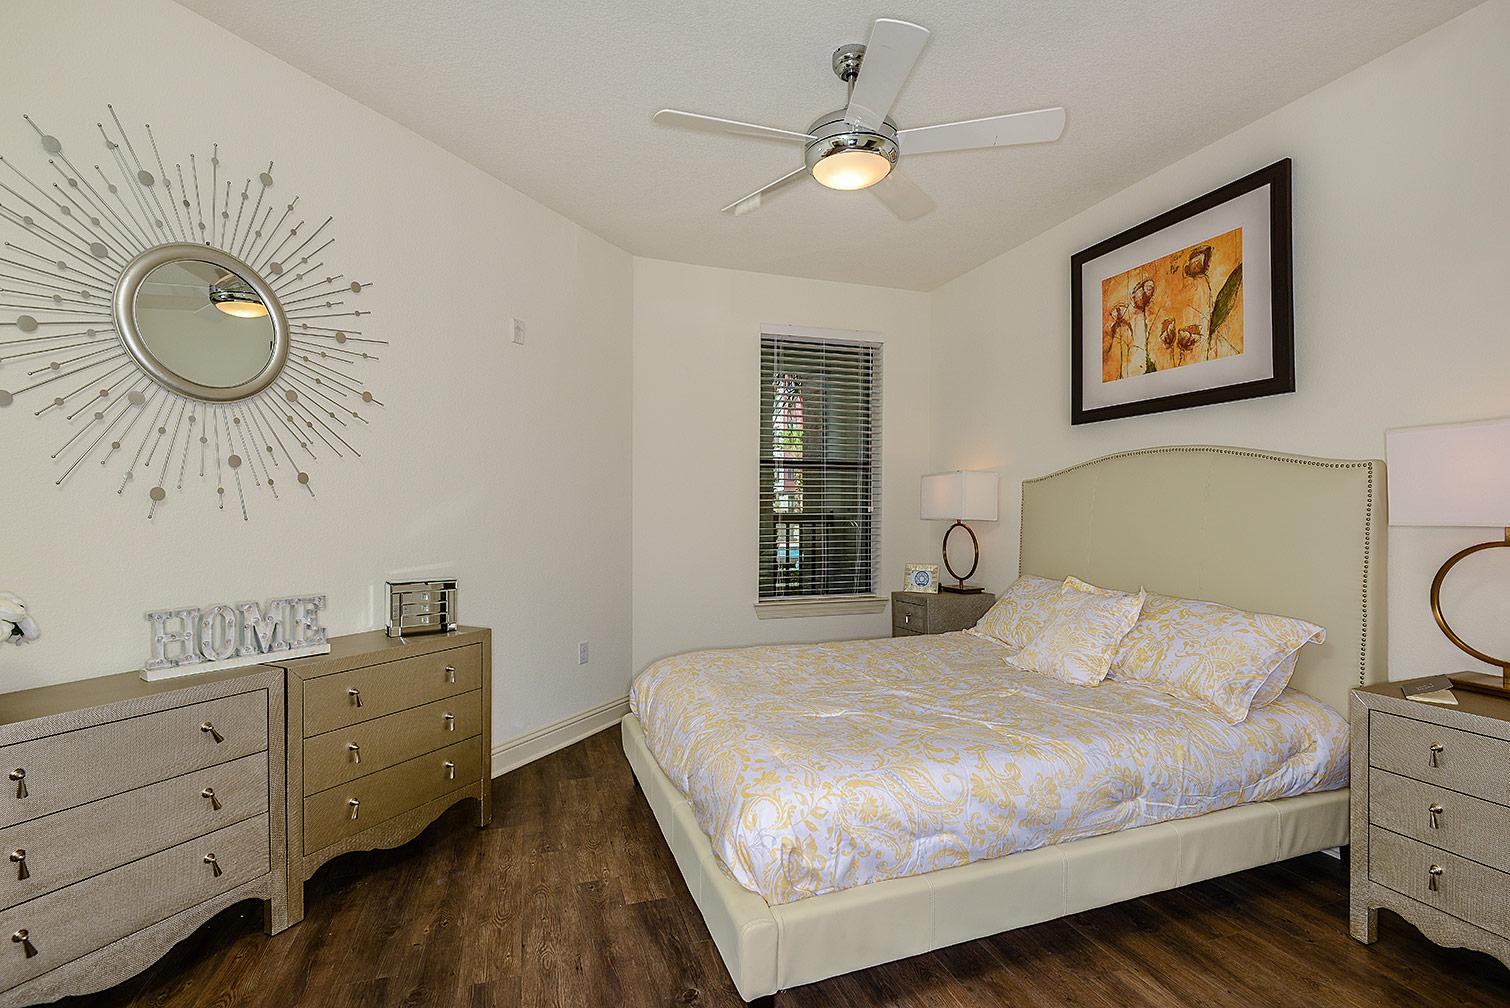 Greystar--EOS-Apartments-8569.jpg